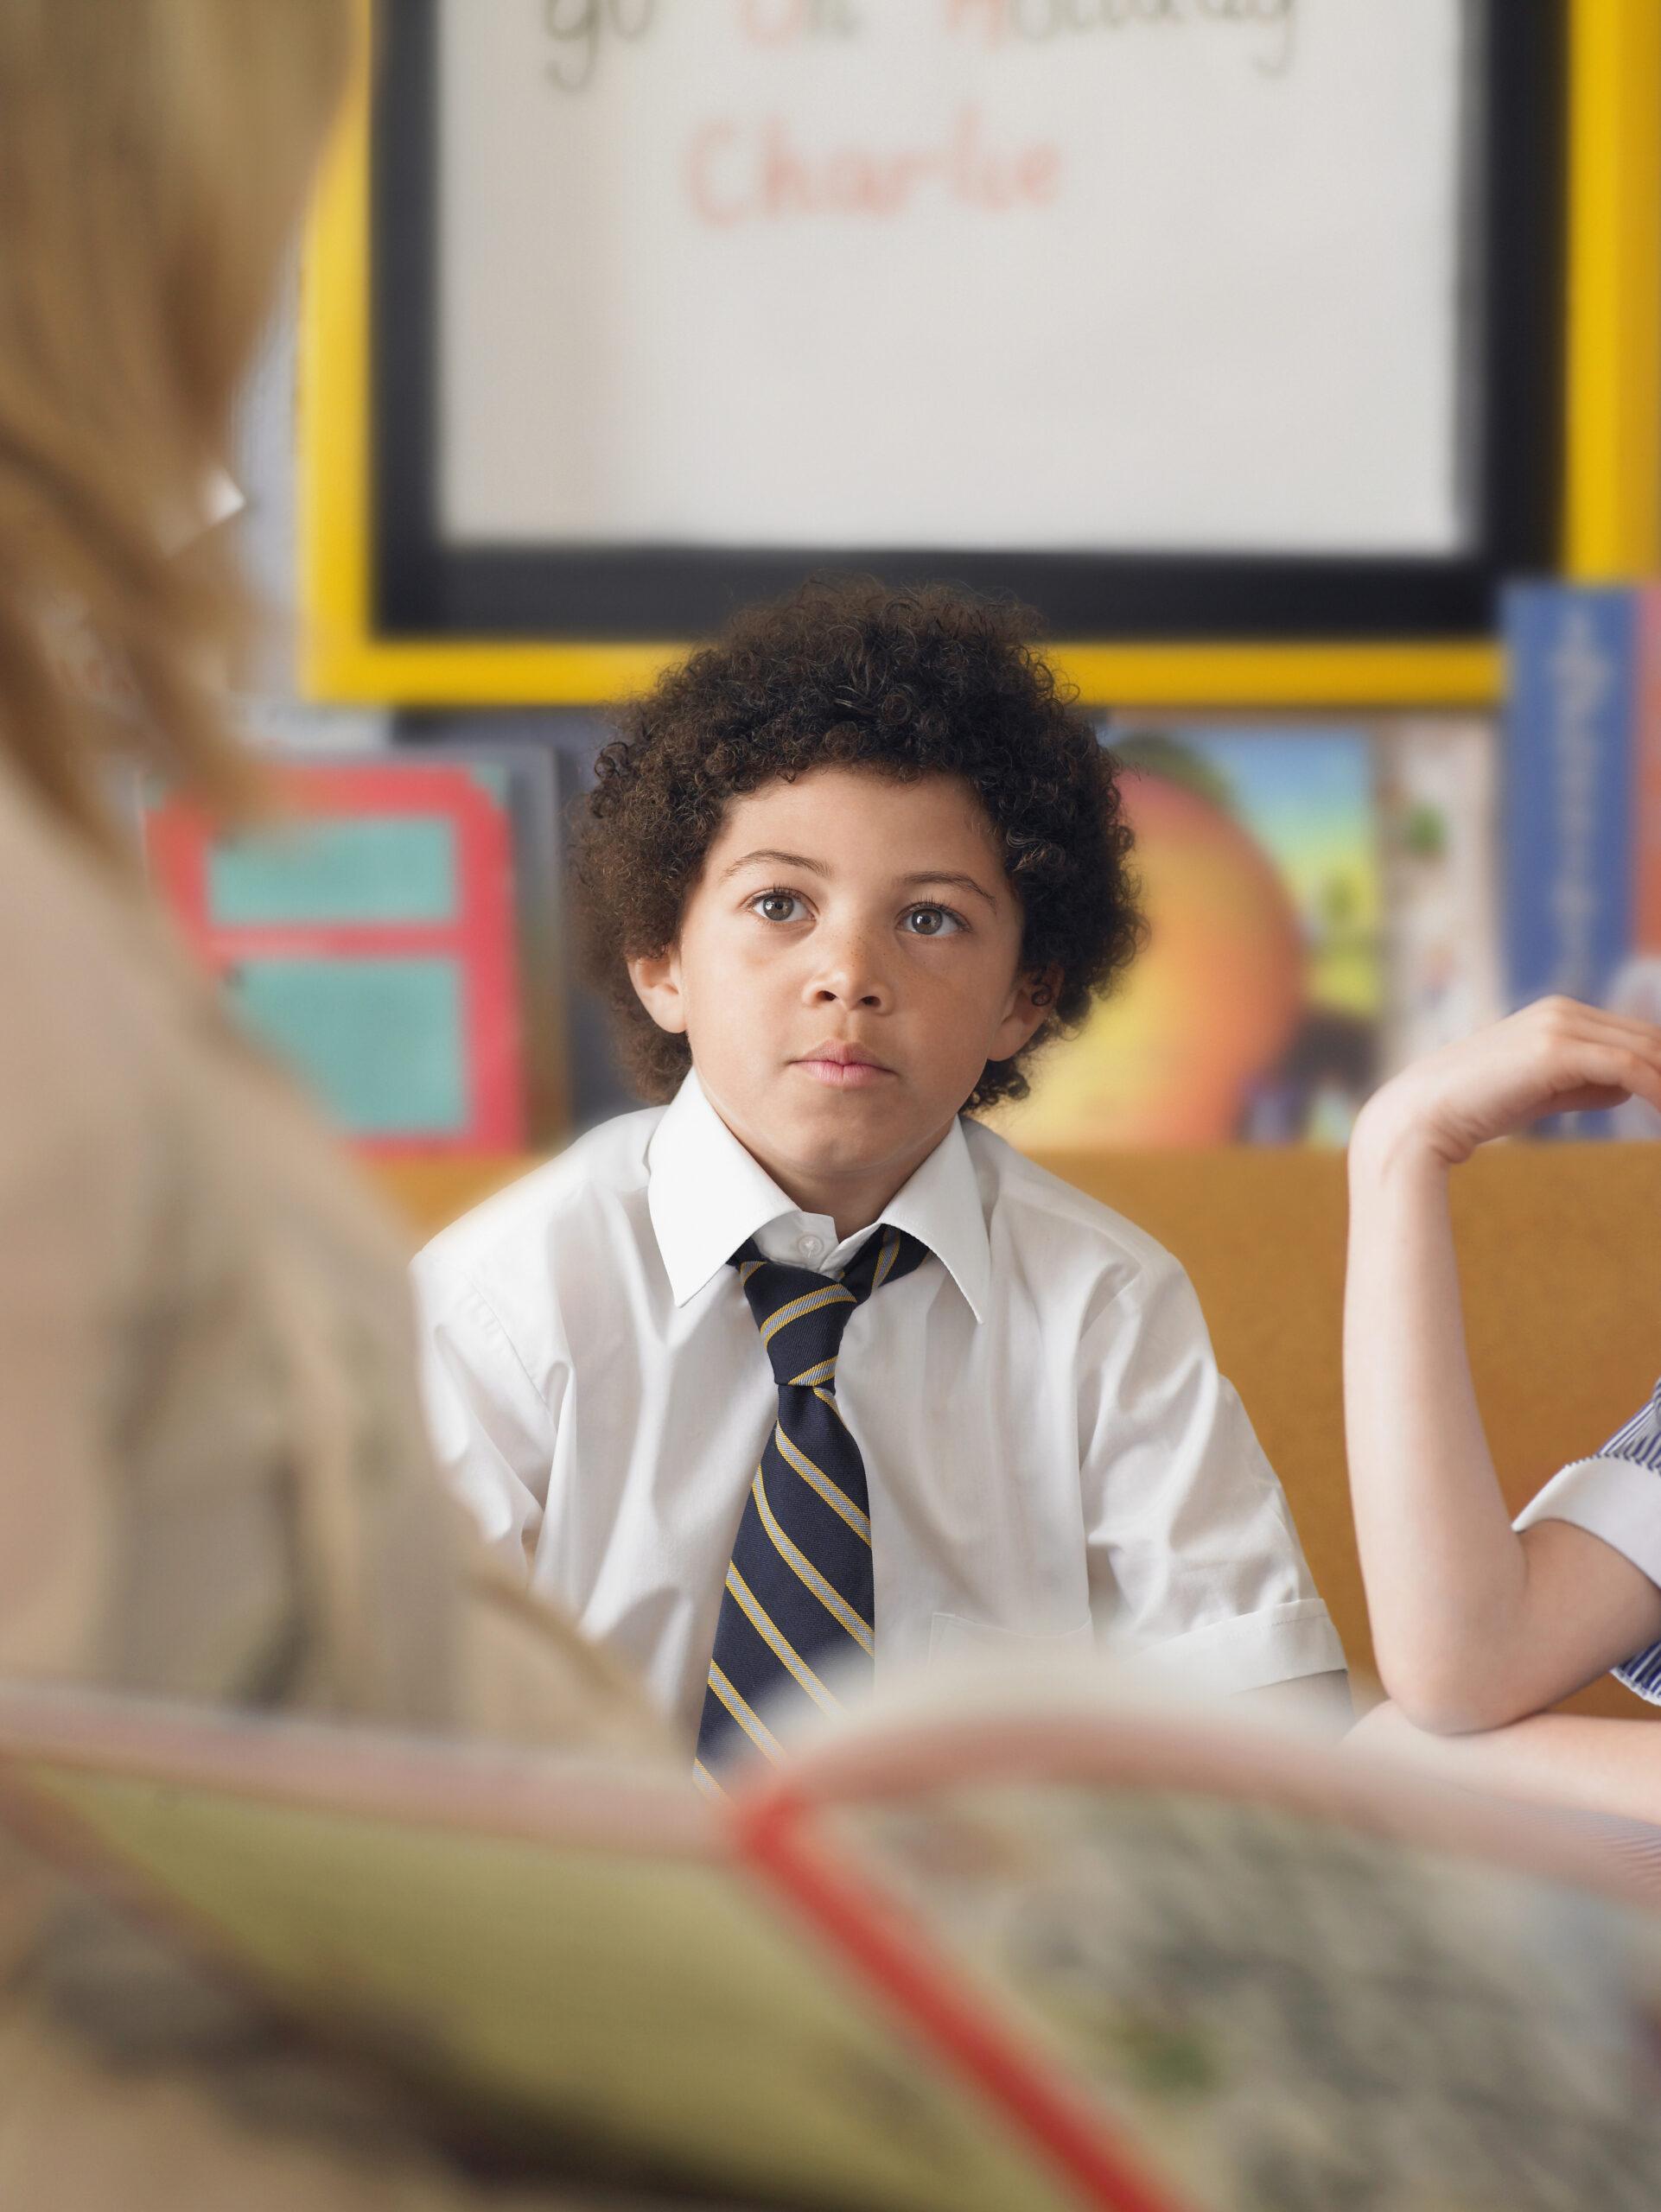 Elementary schoolboy listening to teacher reading in classroom